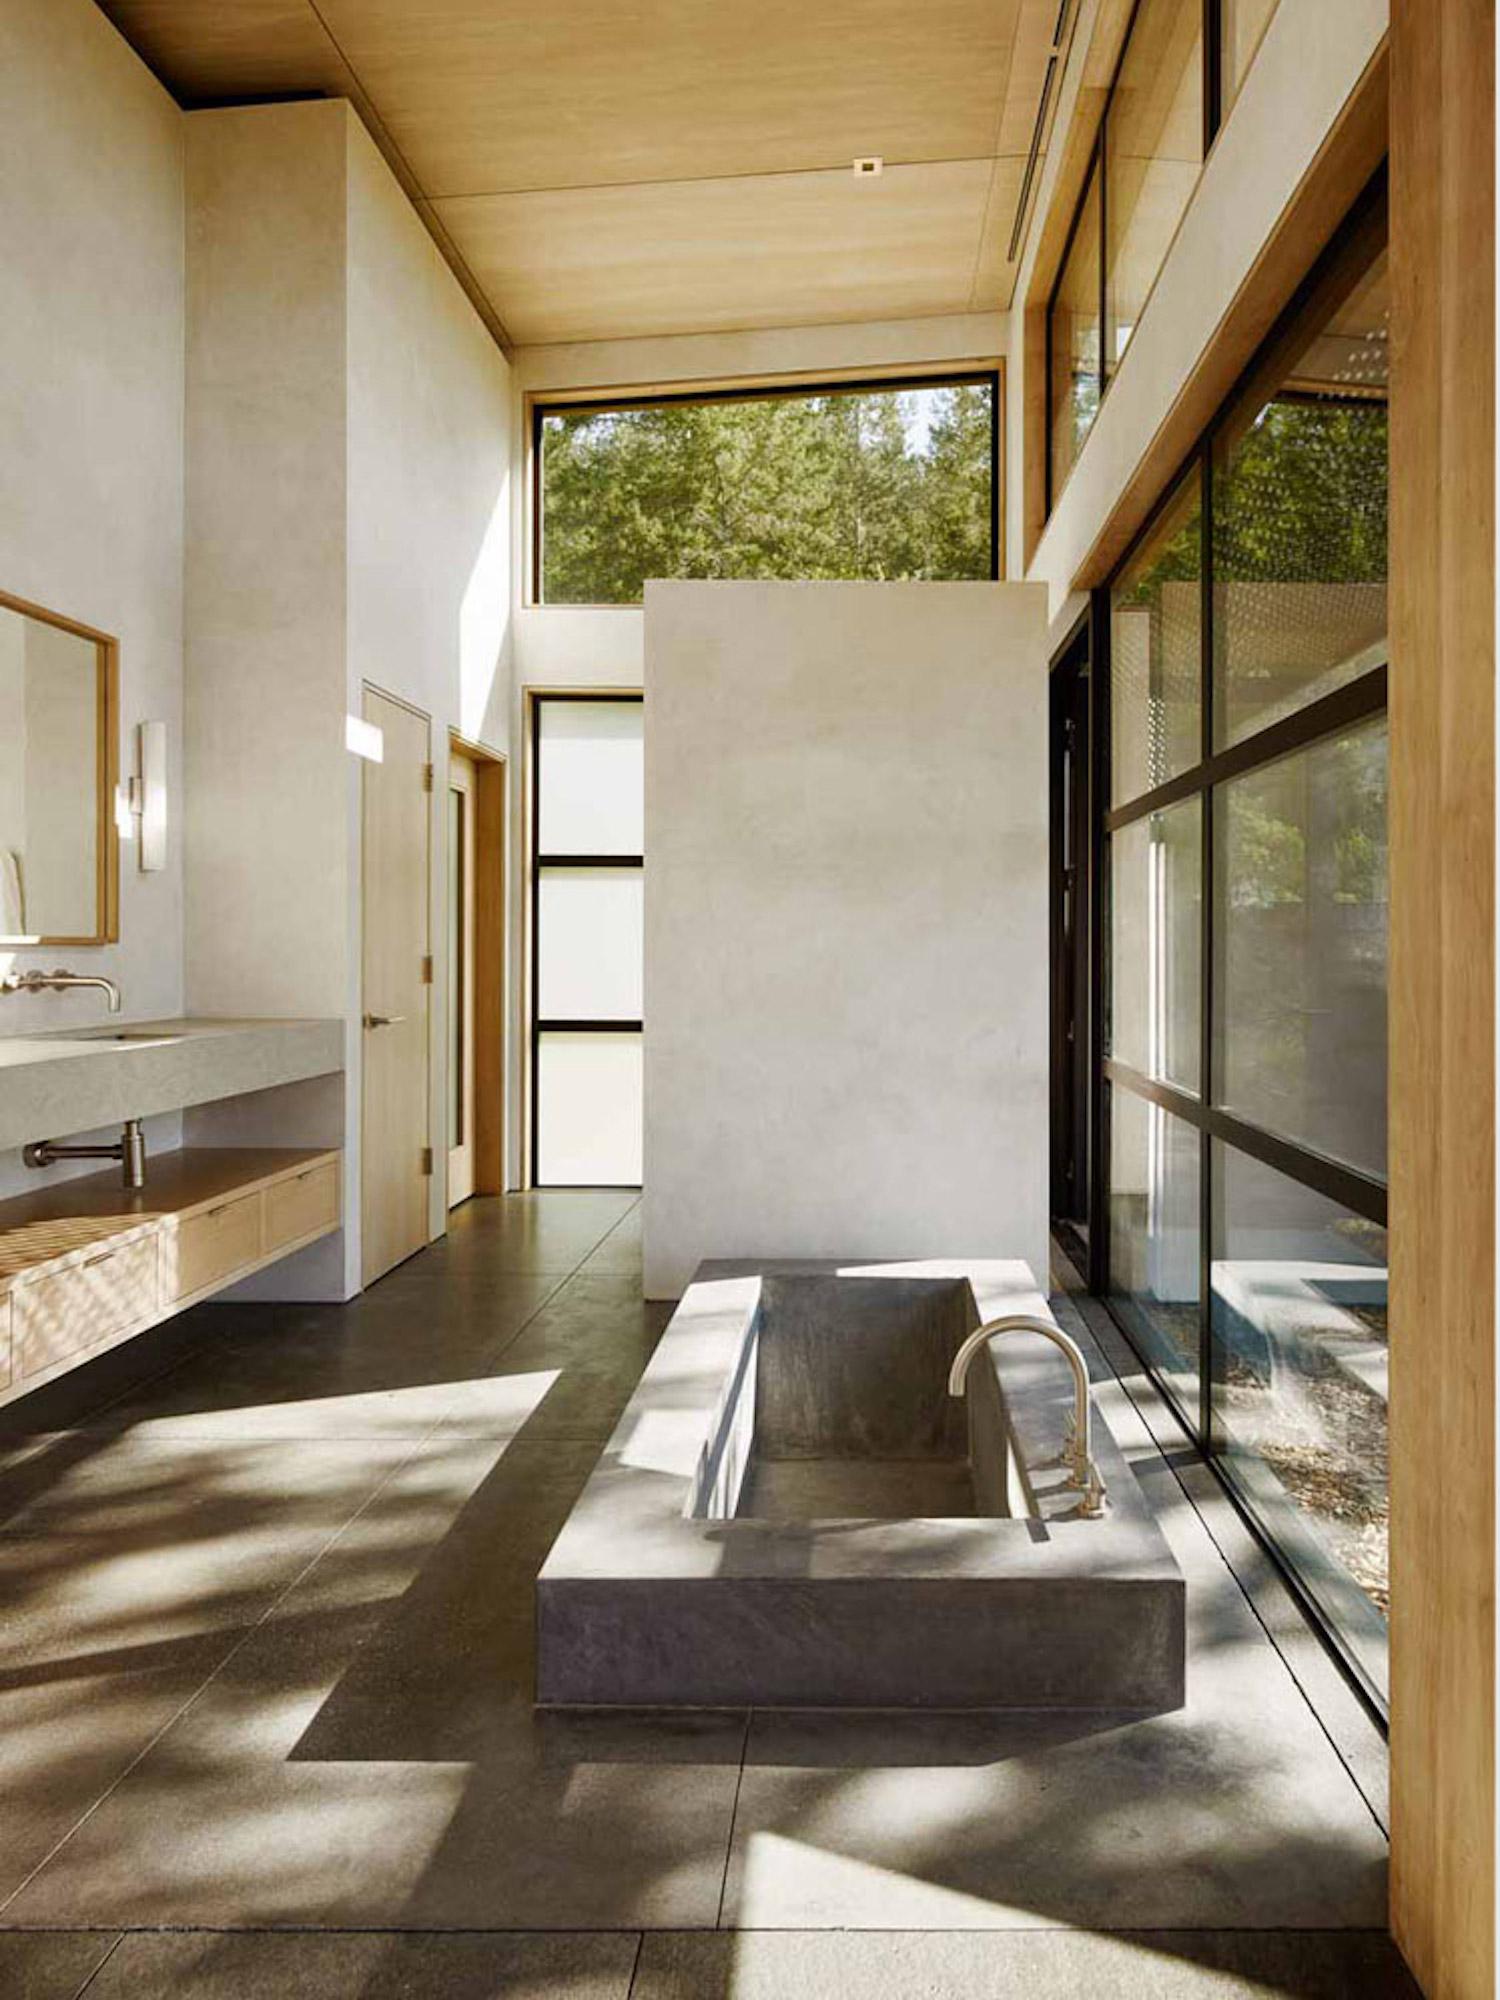 est living house in healdsburg feldman architecture 8